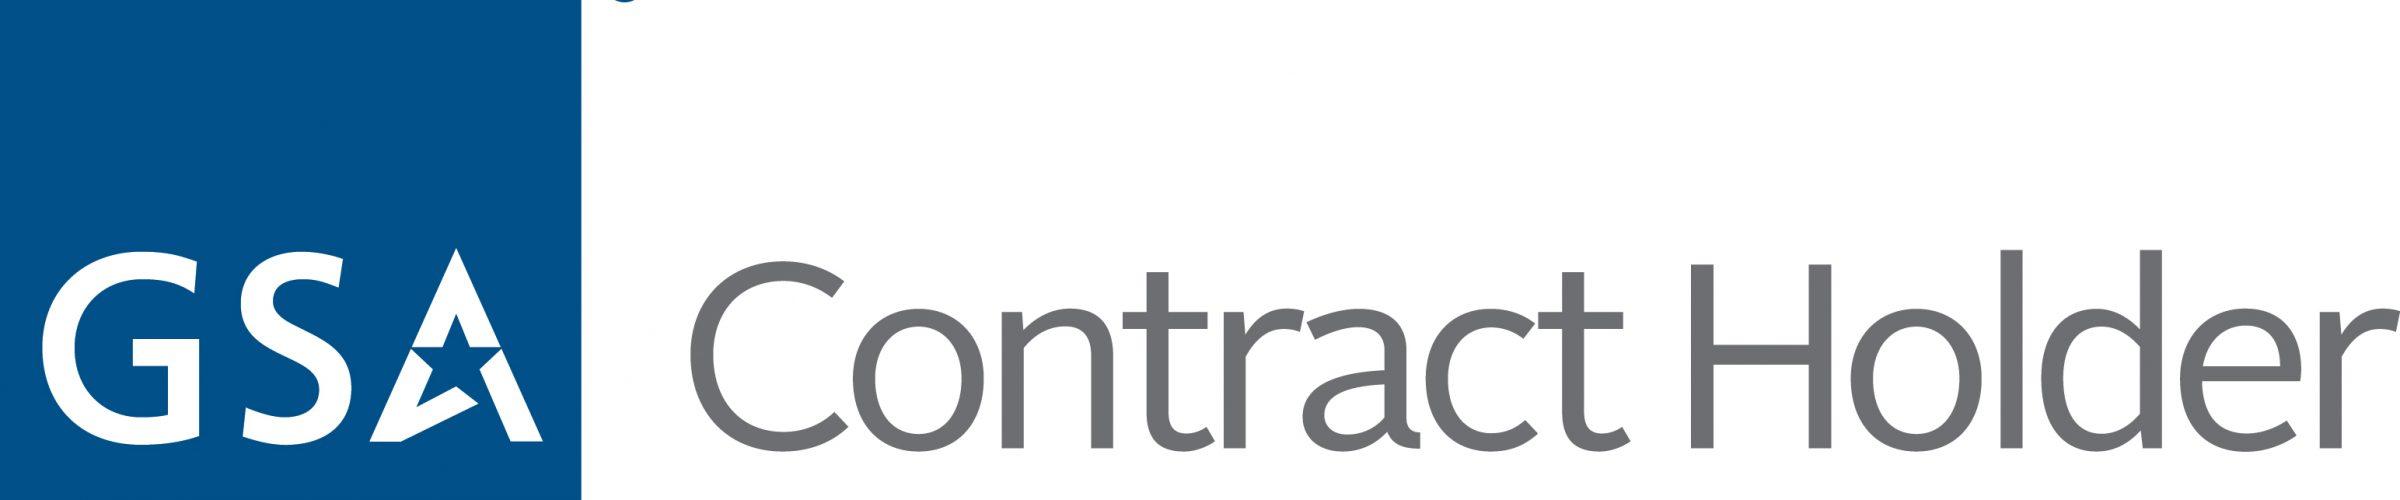 GSA Contract Holder 2017